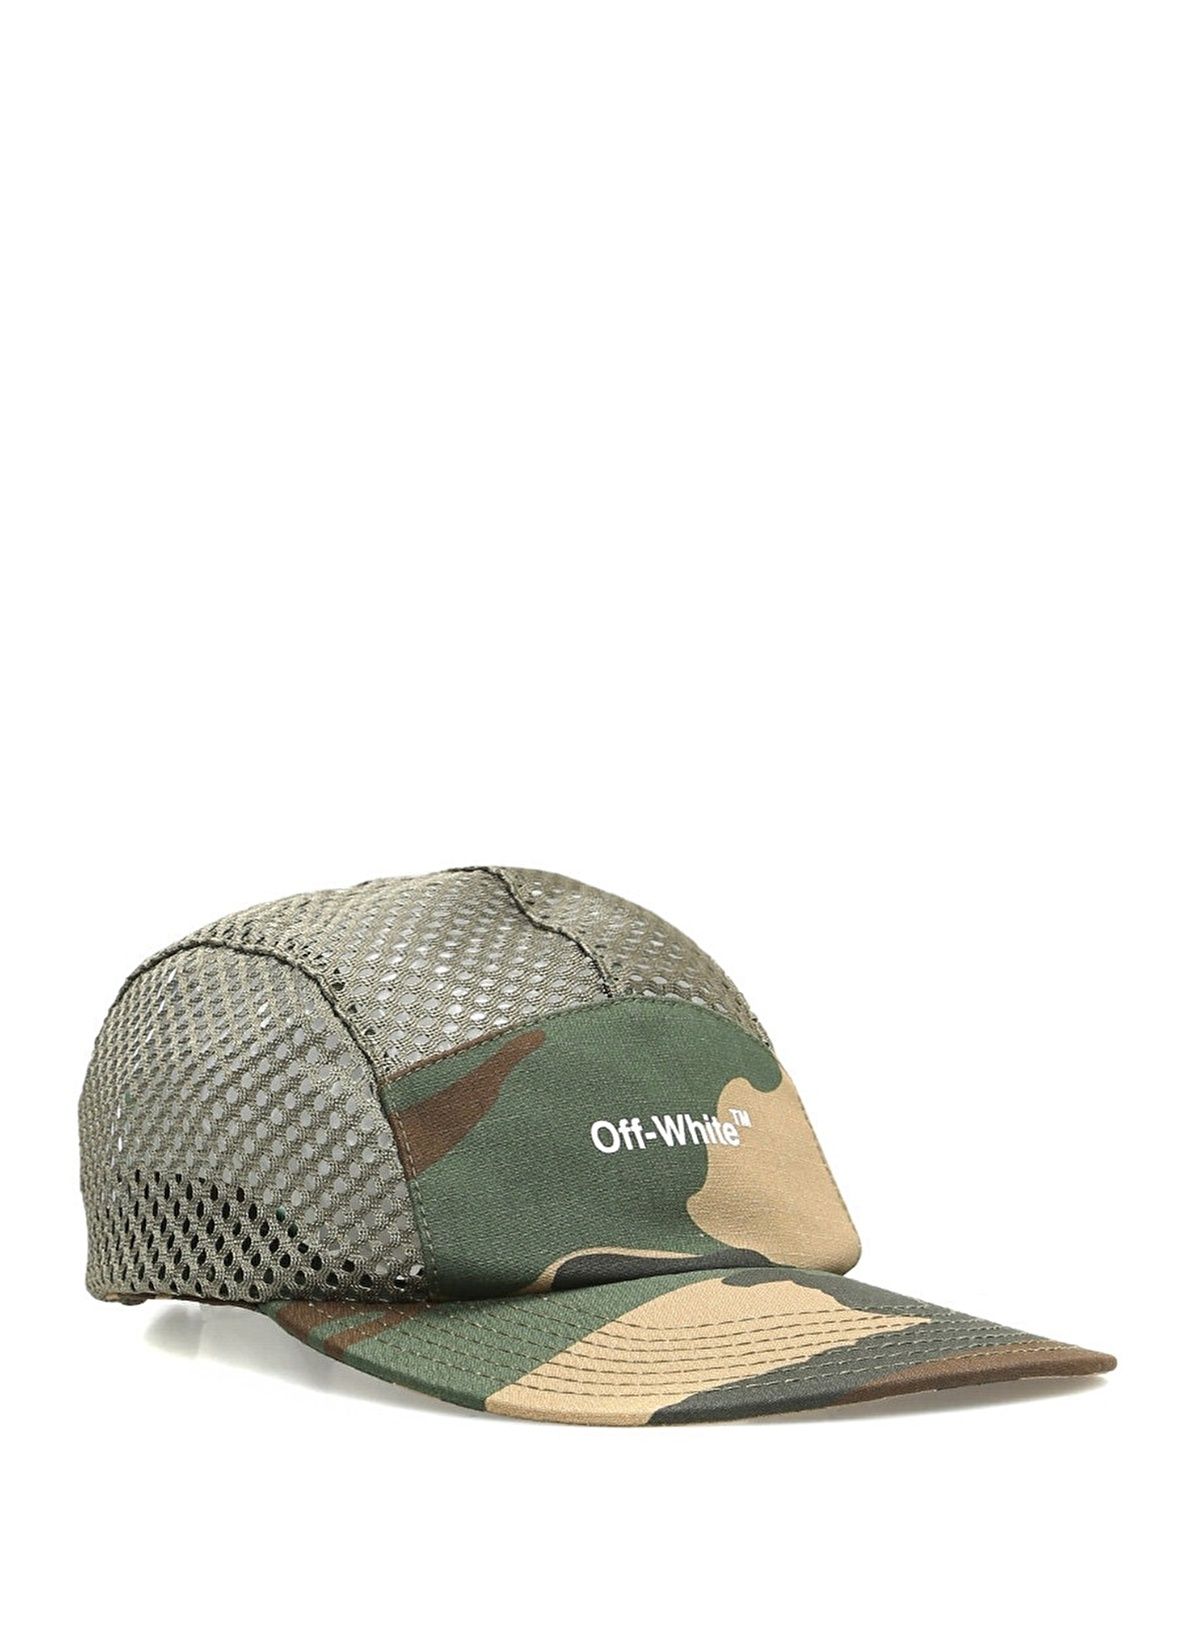 Off-white Şapka 101307080 E Şapka – 1495.0 TL